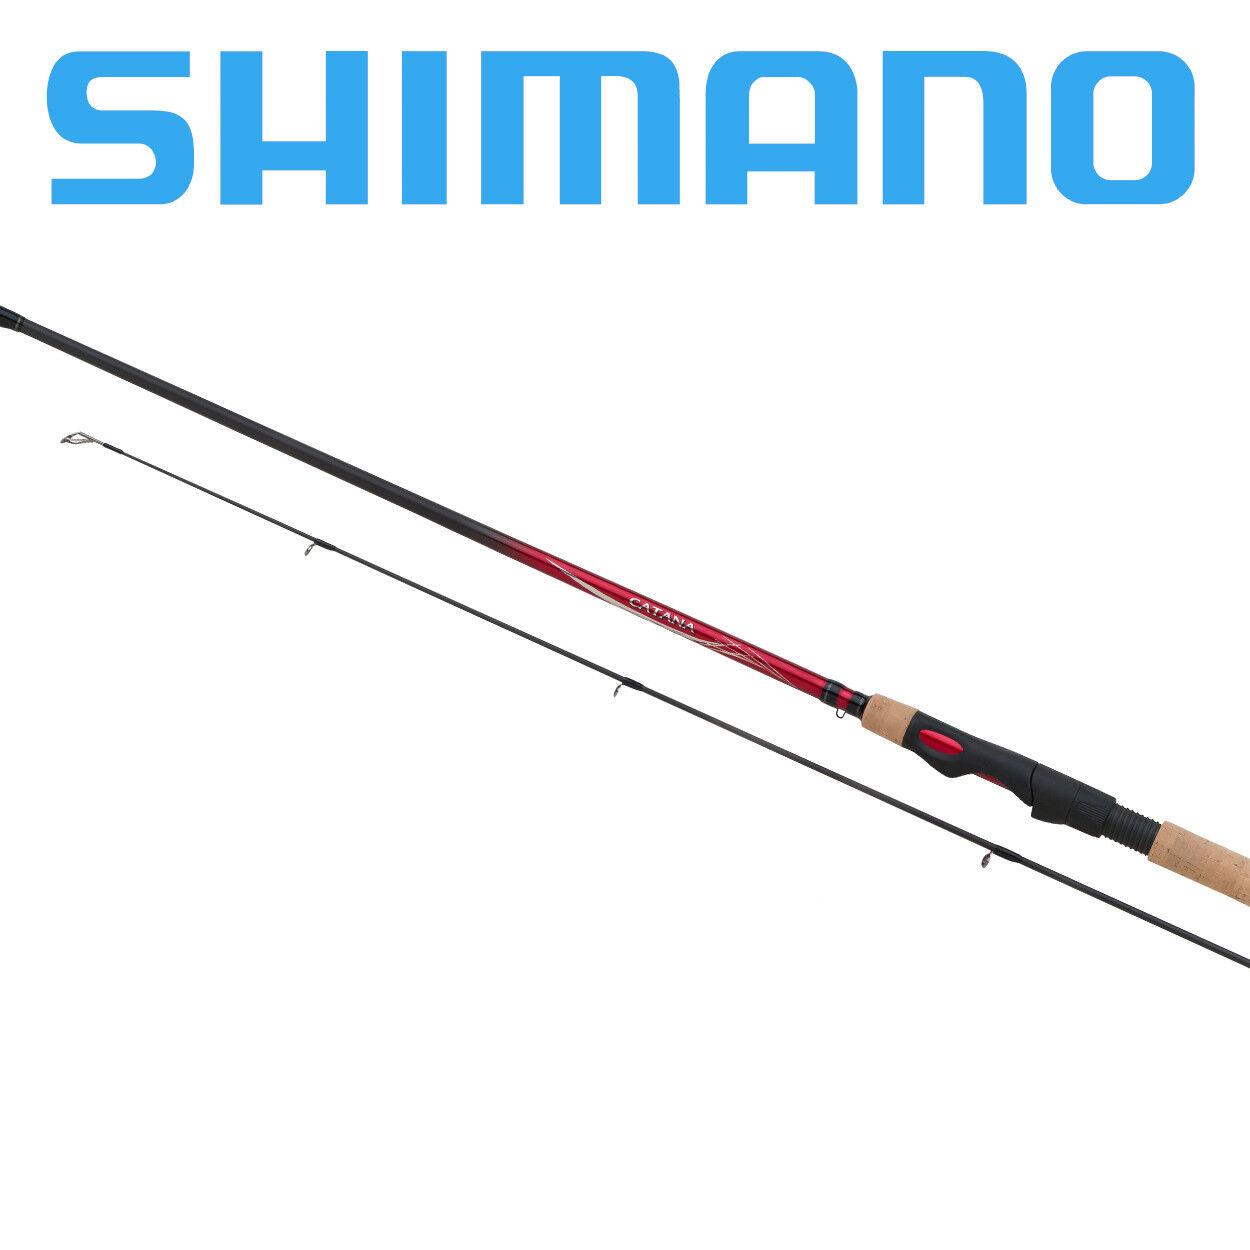 Canna da pesca Shimano Catana EX Spinning rod in carbonio per treda e mare 2 PZ